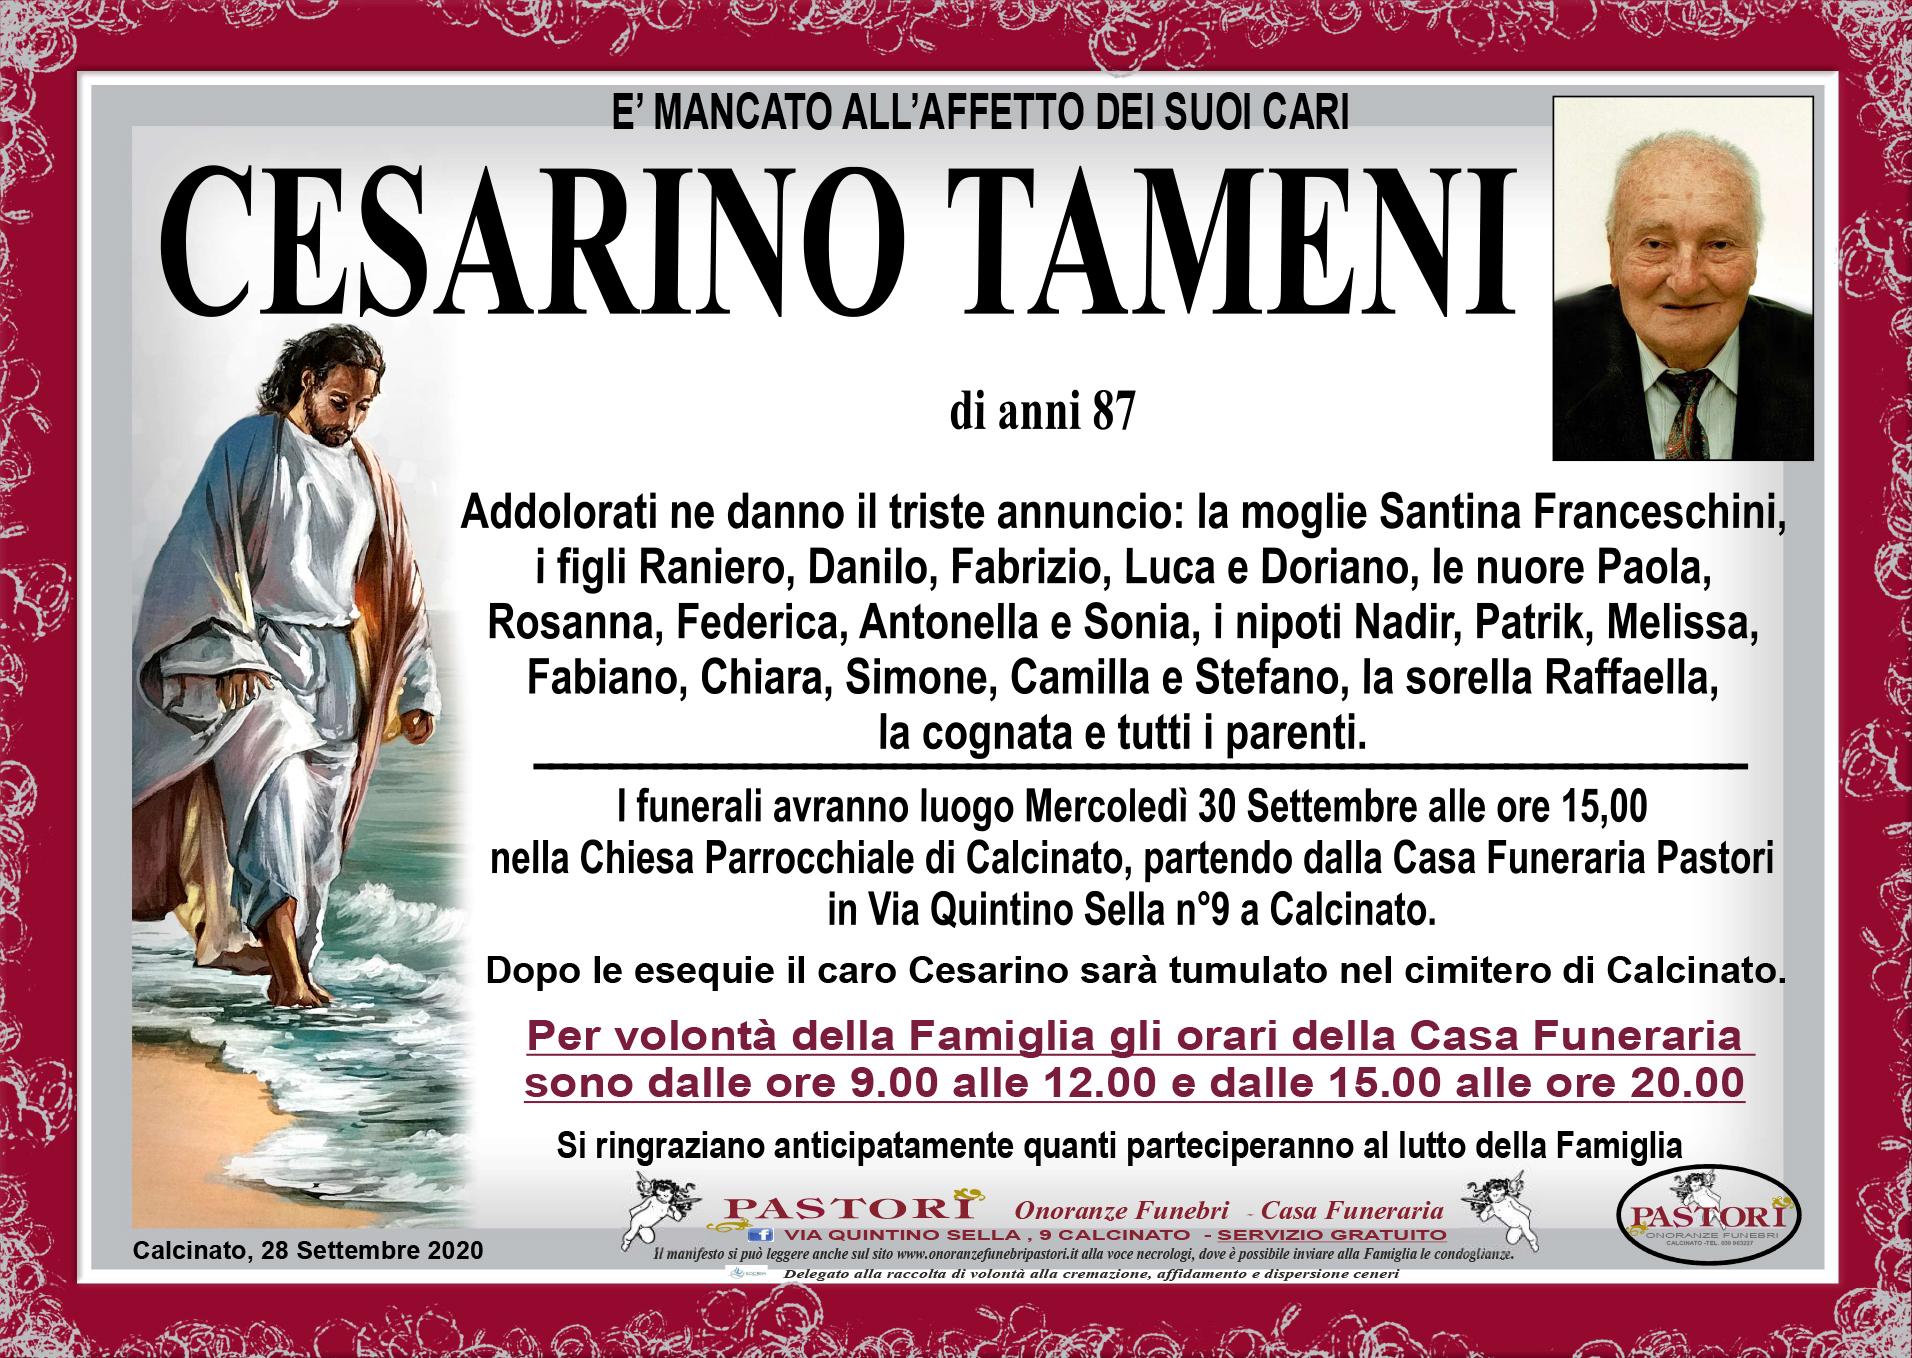 Cesarino Tameni